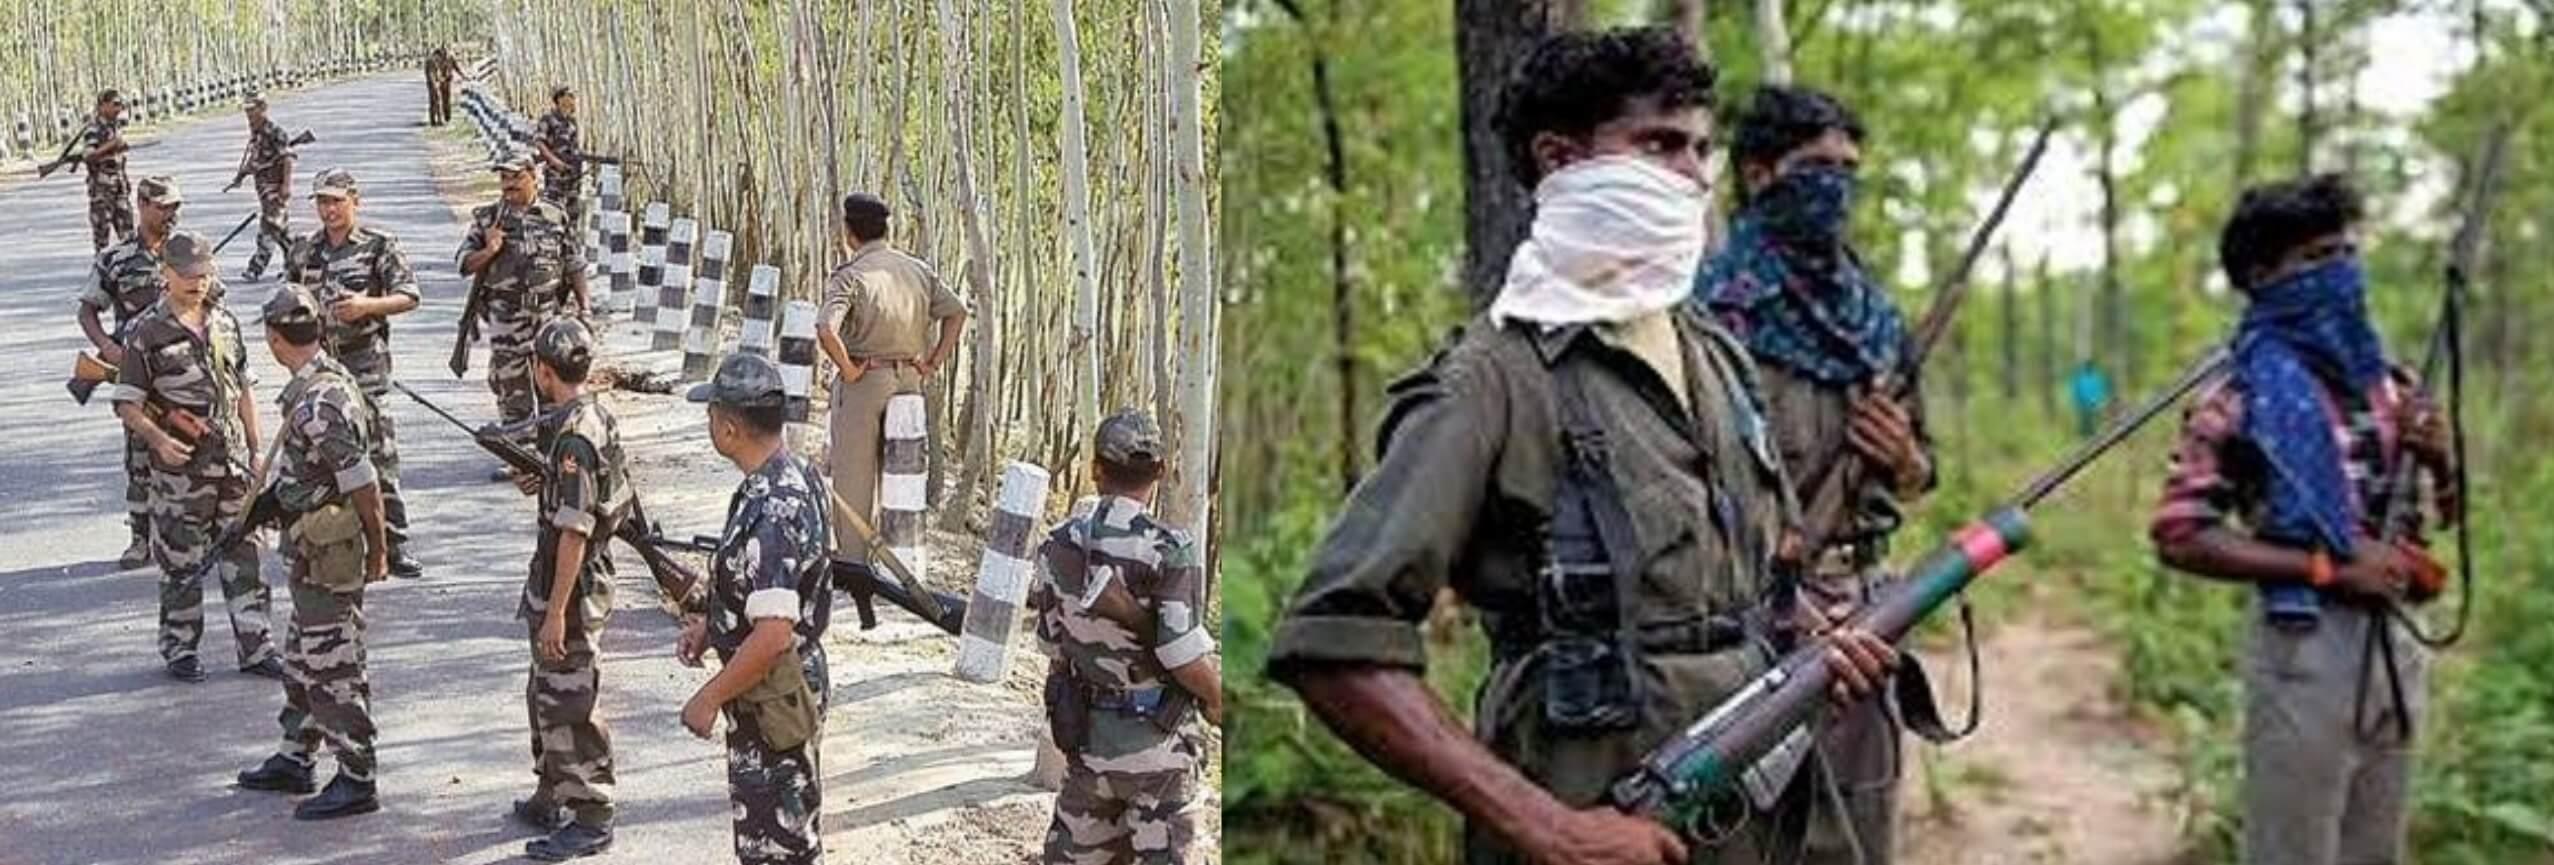 Assam Cops bring Naxal operatives under scanner in State